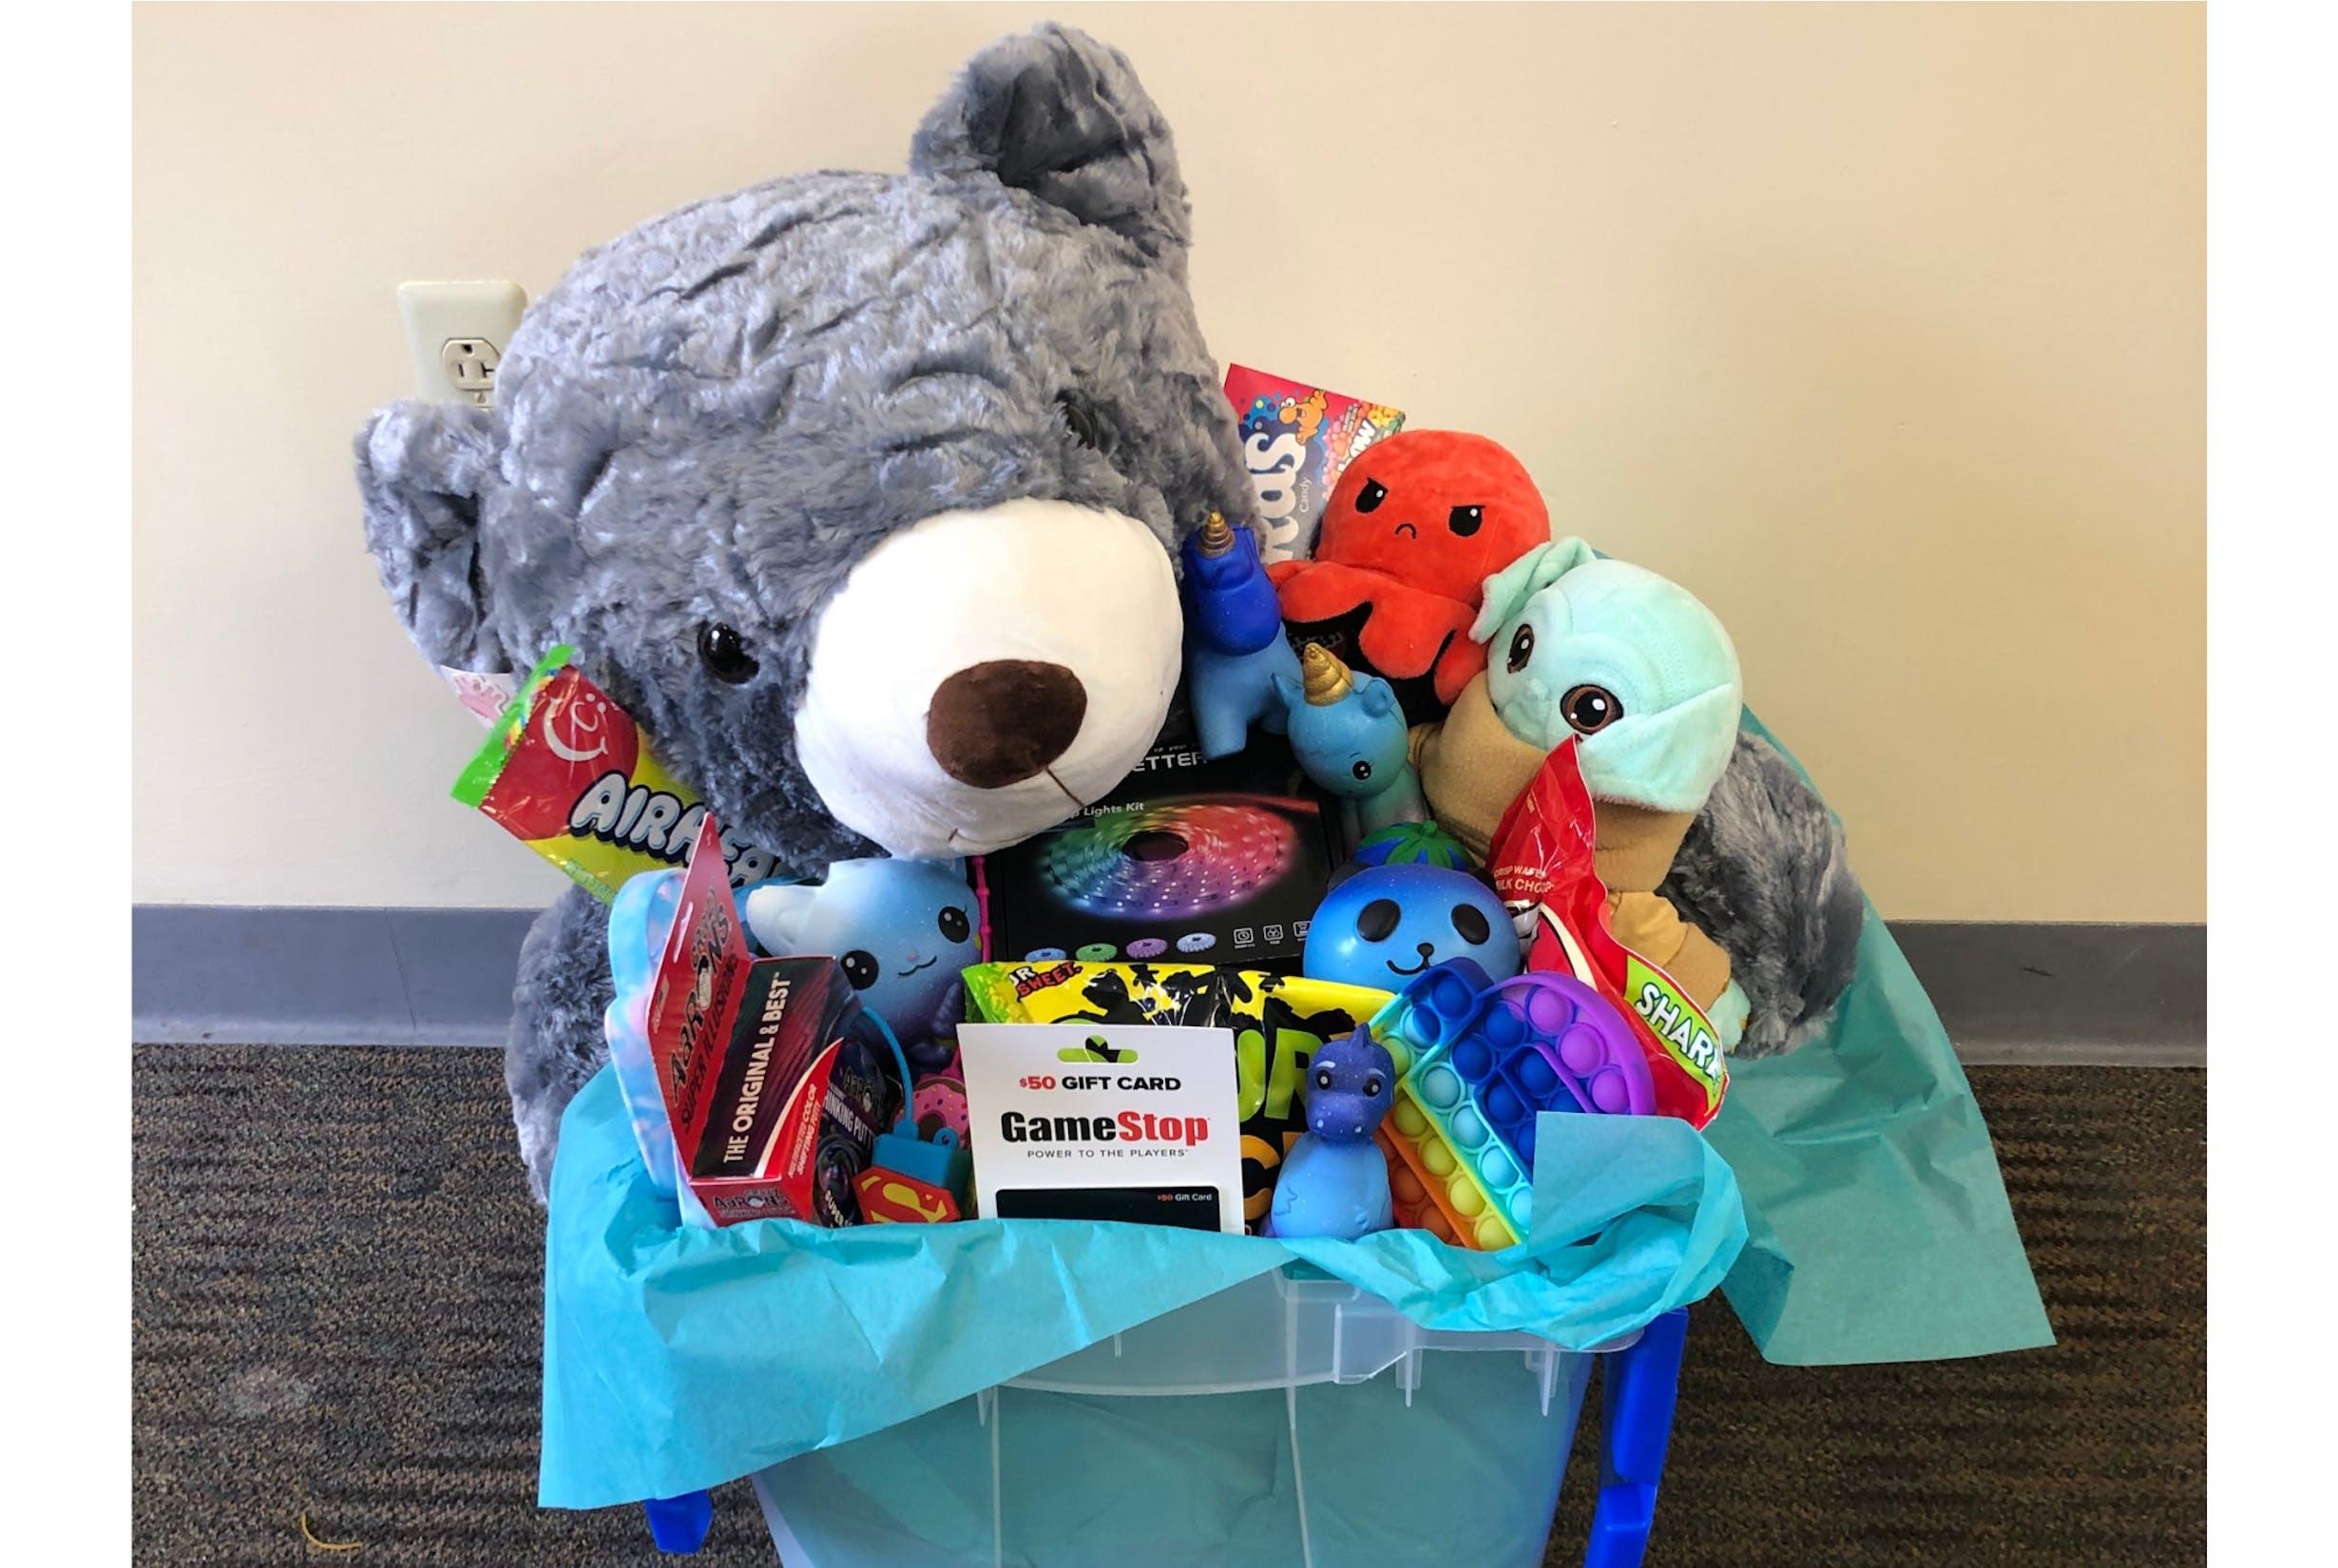 Pandemic Survival Kit for Kids Prize